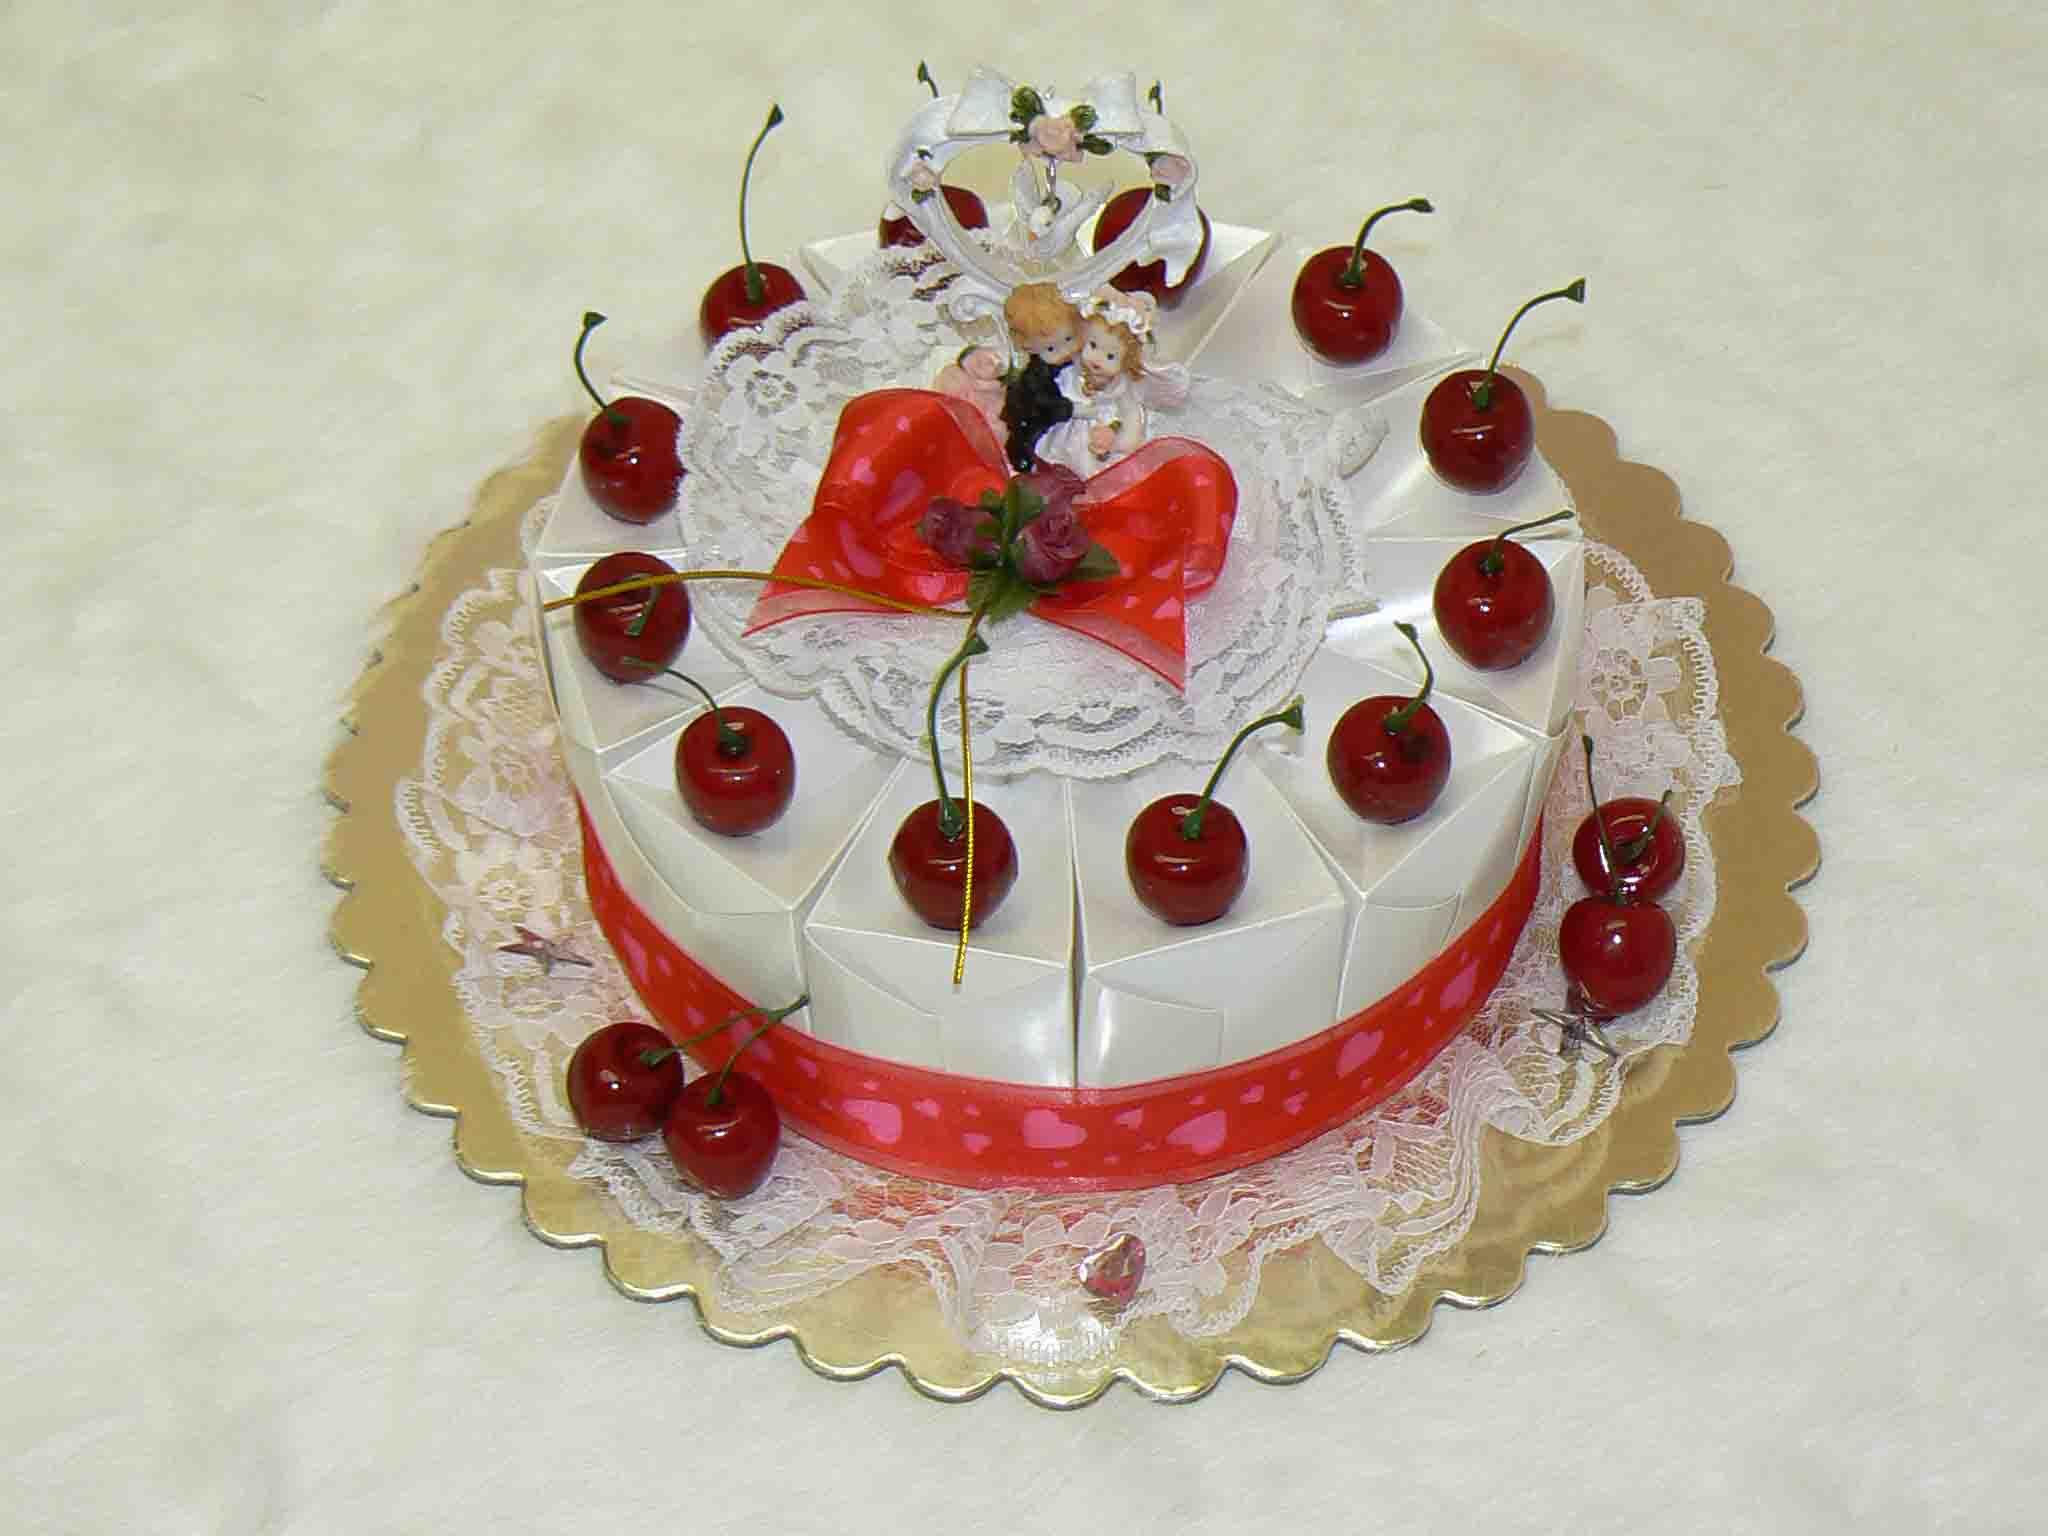 Wedding Cake Favor Box Buy Favor Box Product on Alibaba